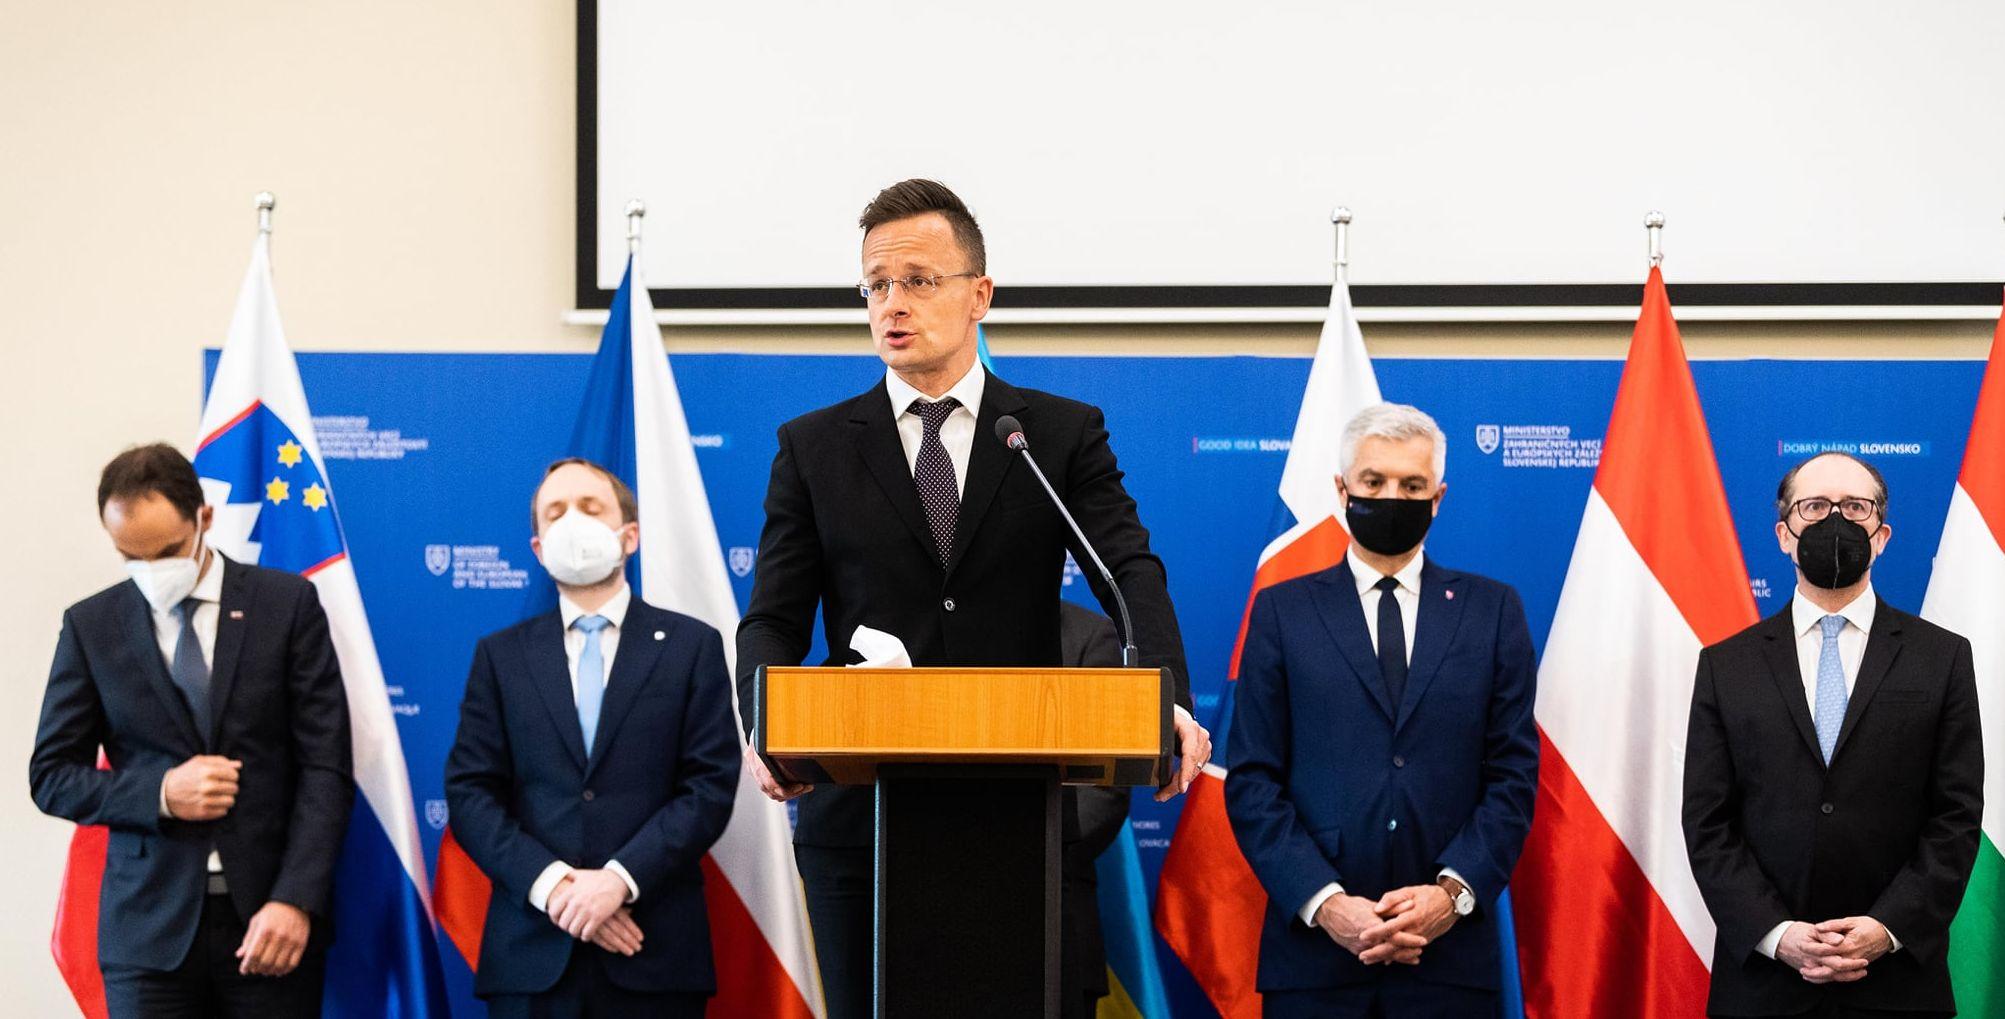 FM Szijjártó: Central Europe Should Excel in Approving Immunity Certificates